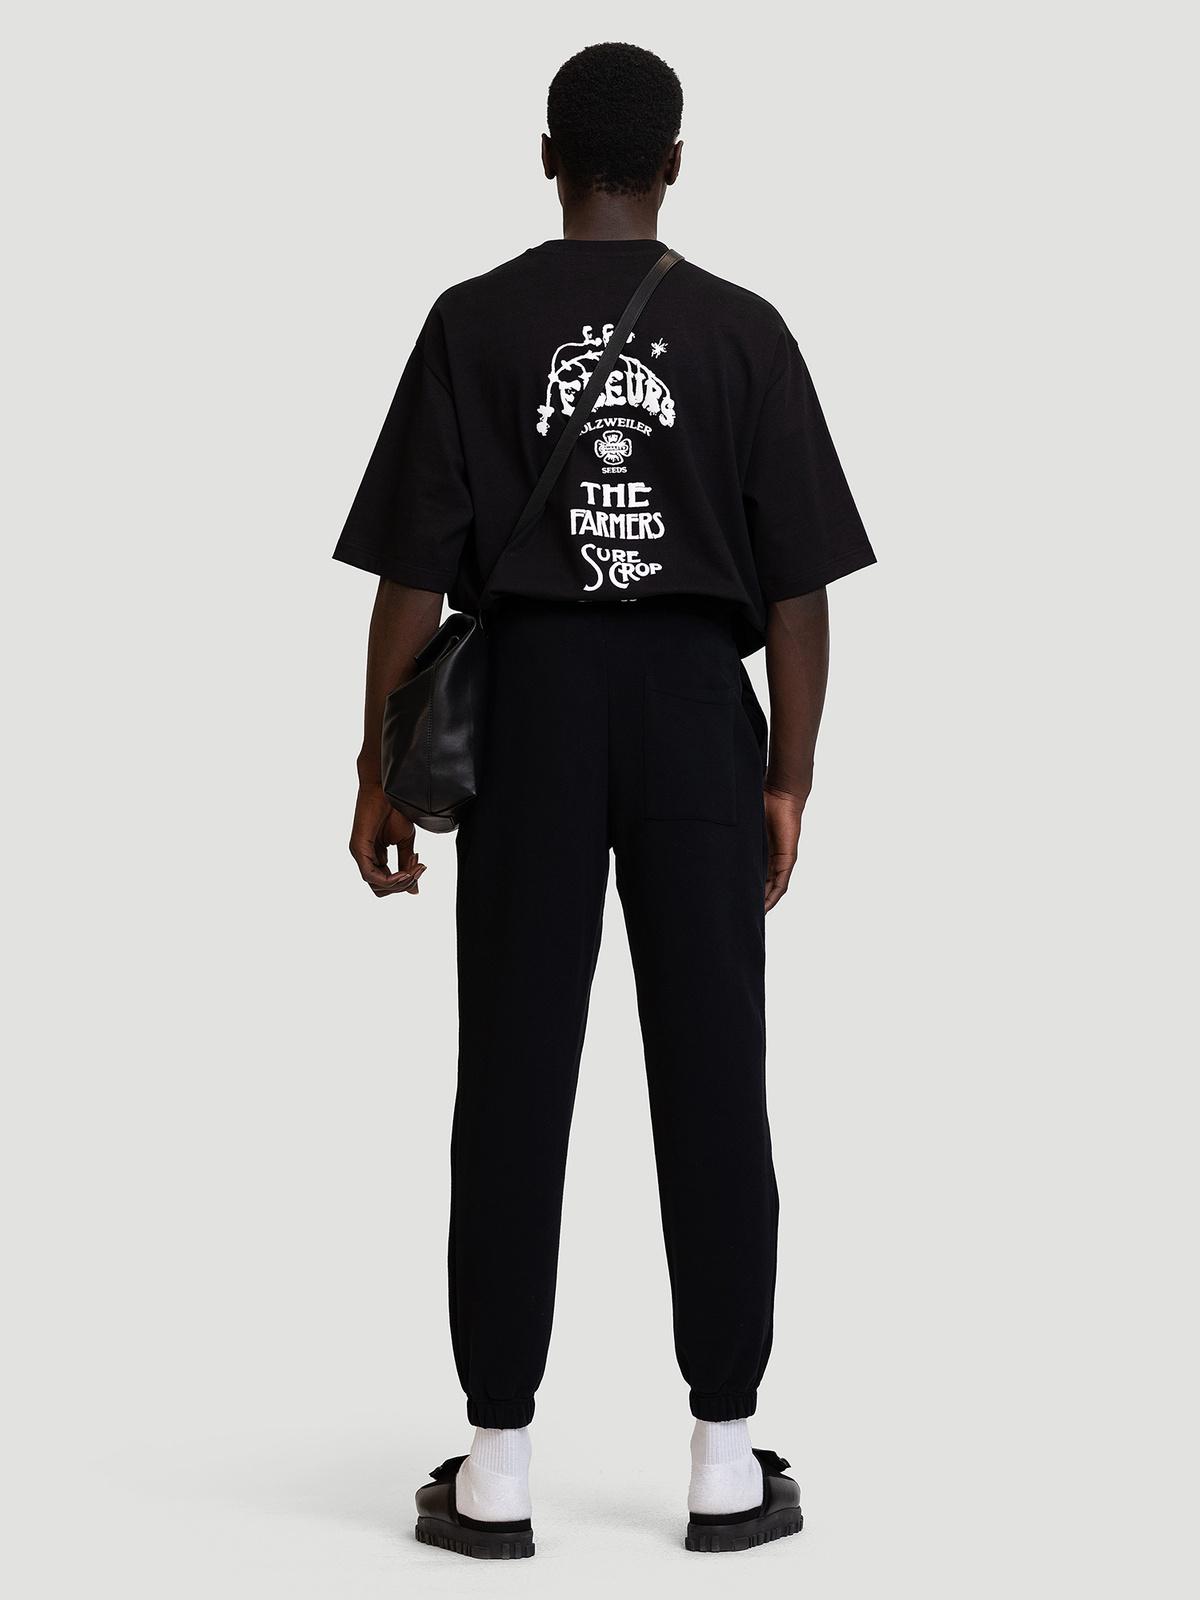 M. Oslo Sweat Trouser Black 2